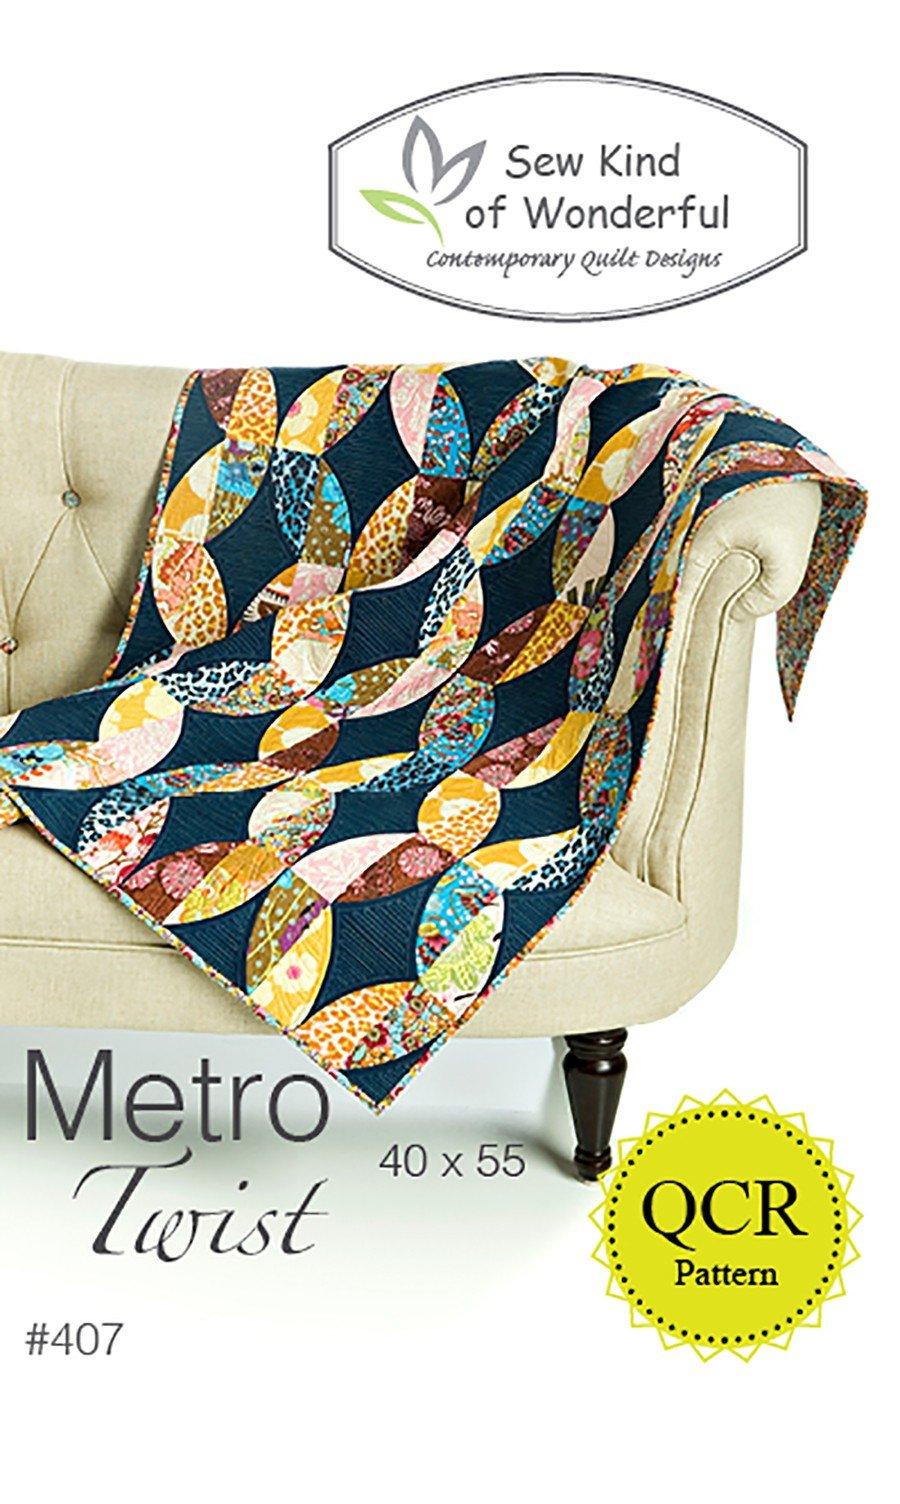 QCR - Metro Twist